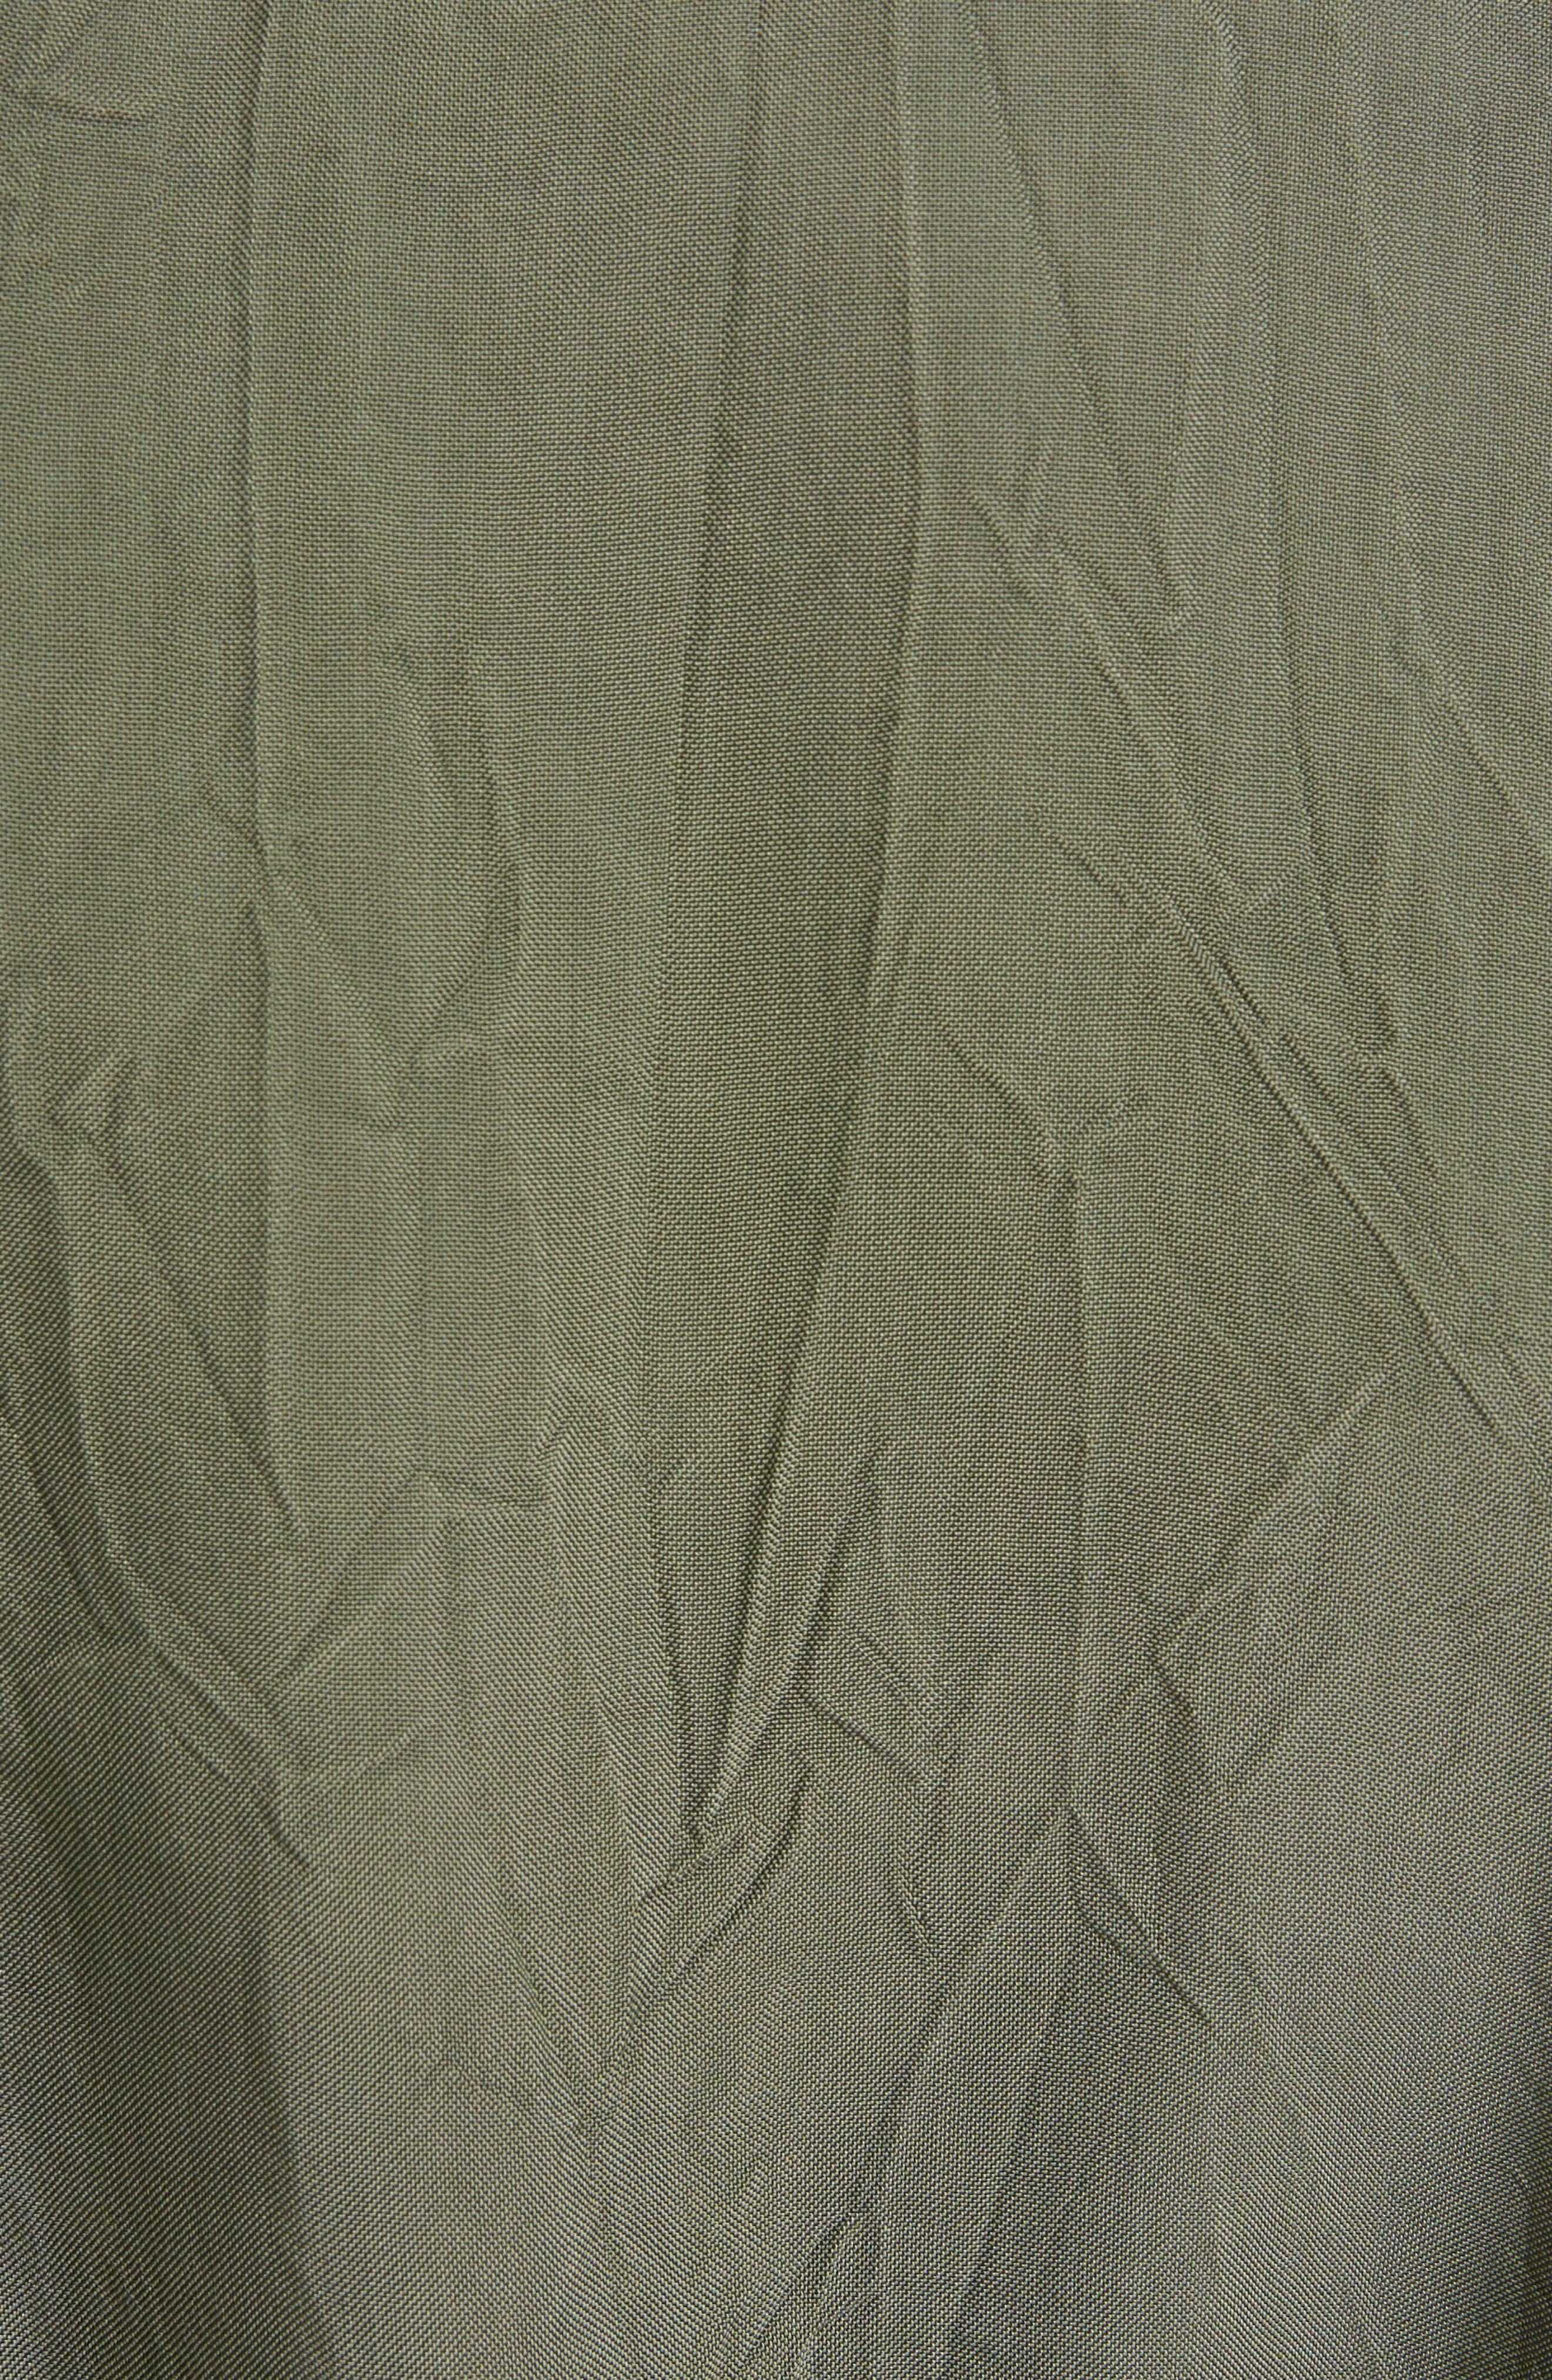 Crinkled Trench Coat,                             Alternate thumbnail 5, color,                             300